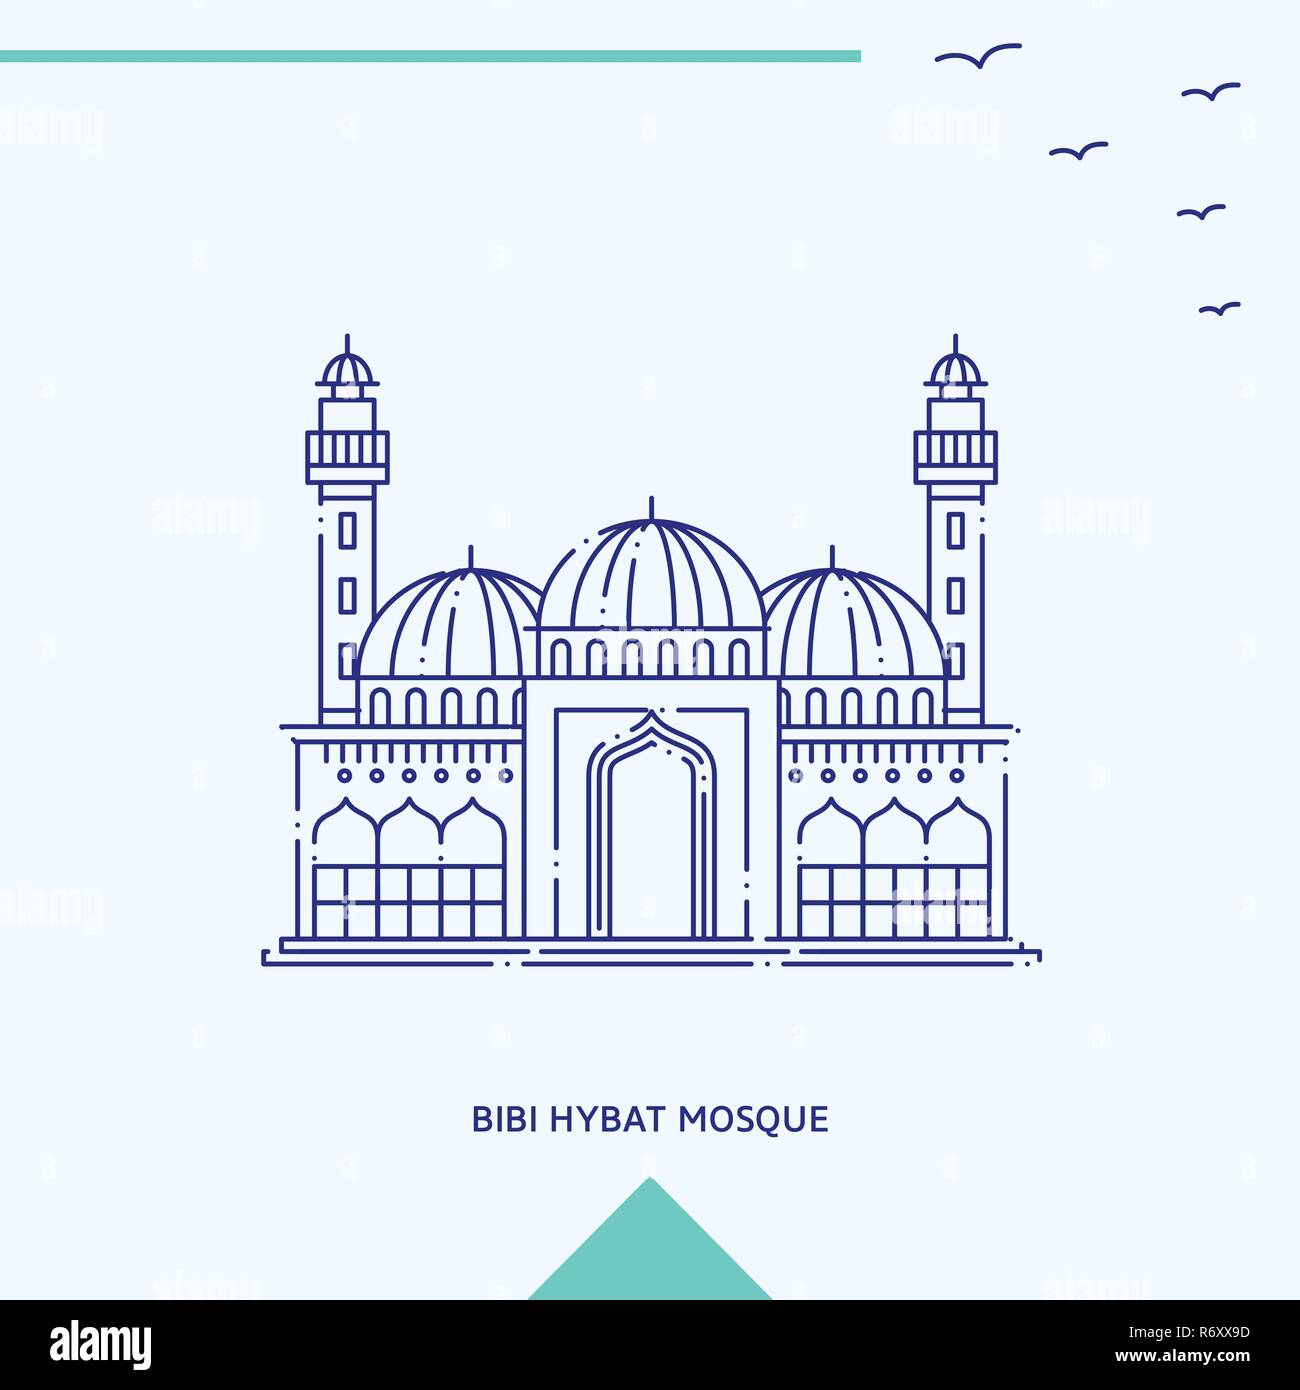 BIBI HYBAT MOSQUE skyline vector illustration - Stock Vector